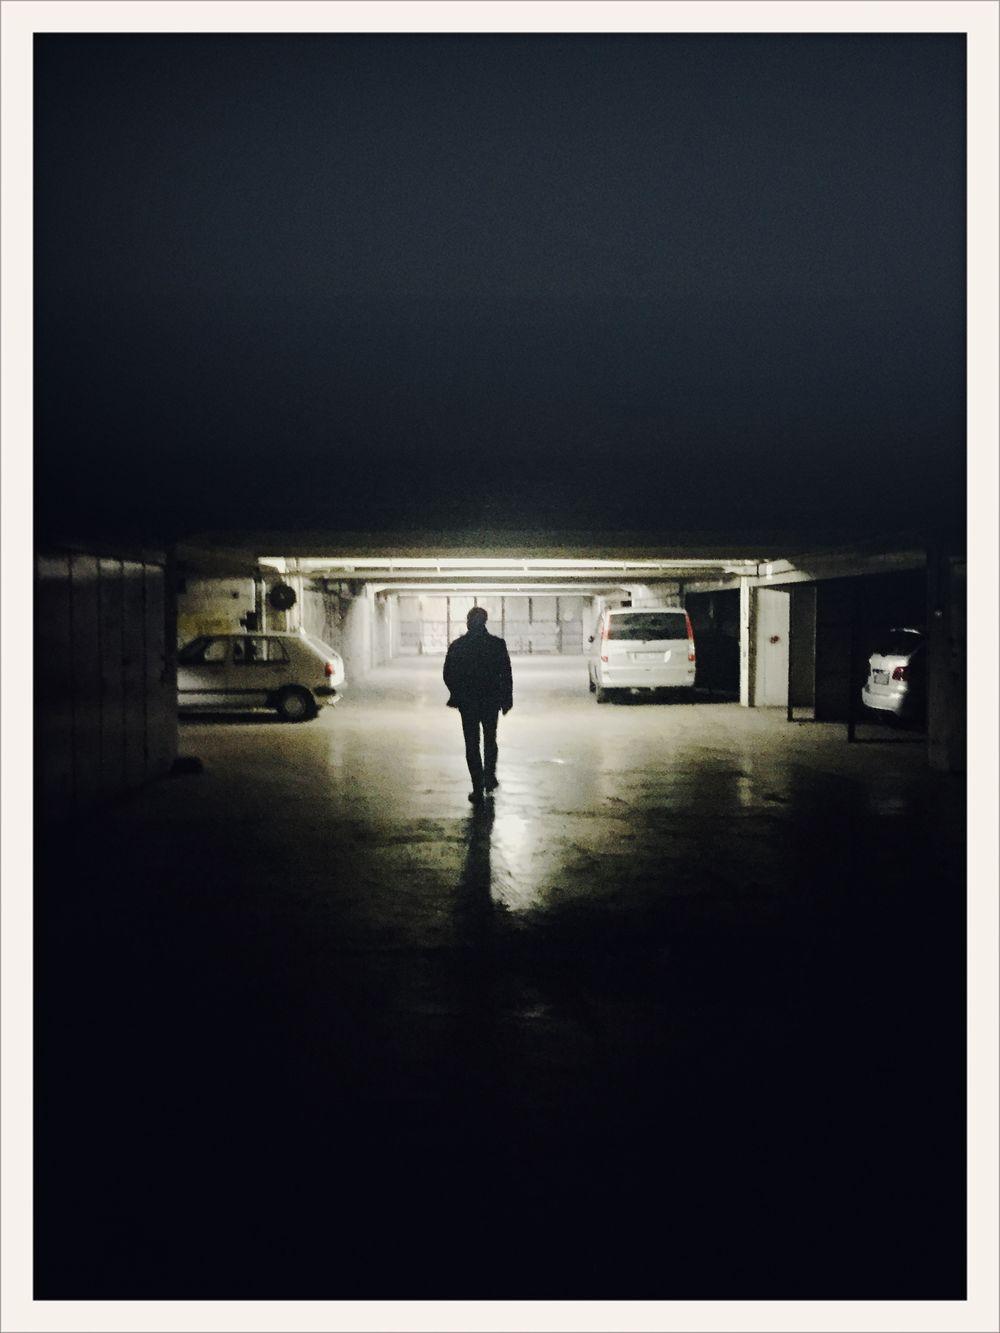 Alone Berlin Black And White Dark Kantgaragen One Man Only Solitude TakeoverContrast